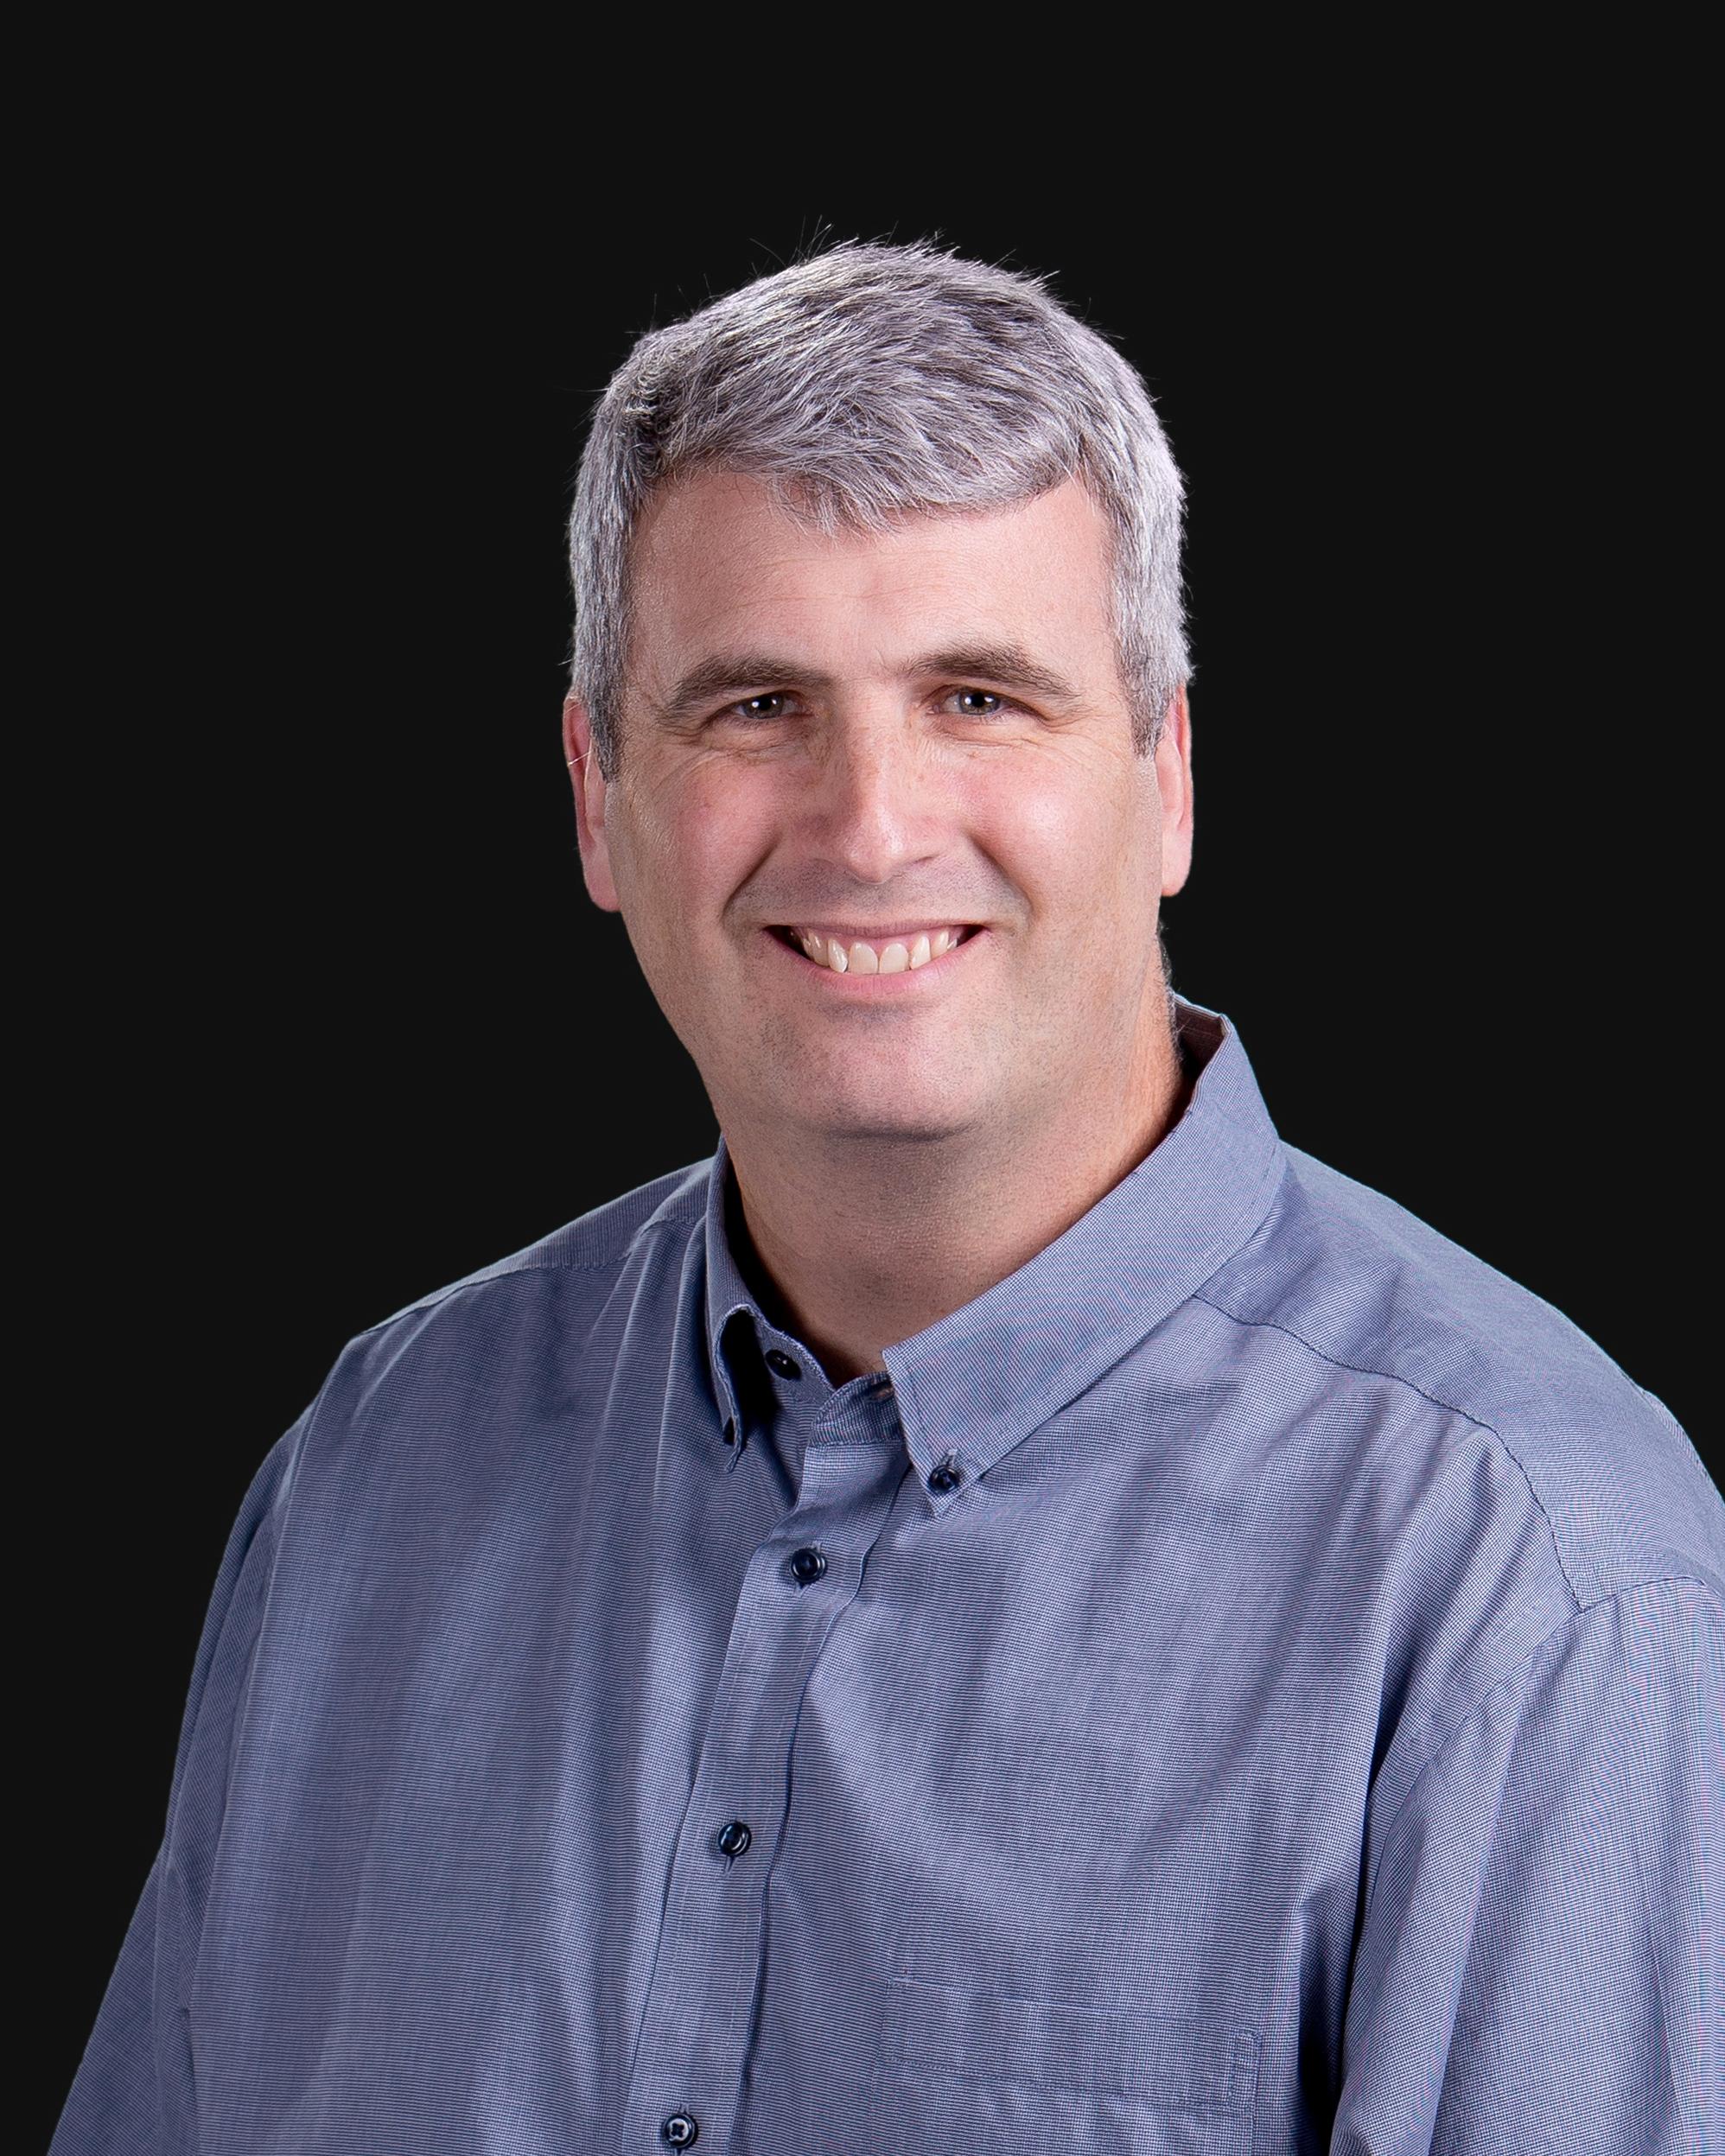 Steve Welty HS